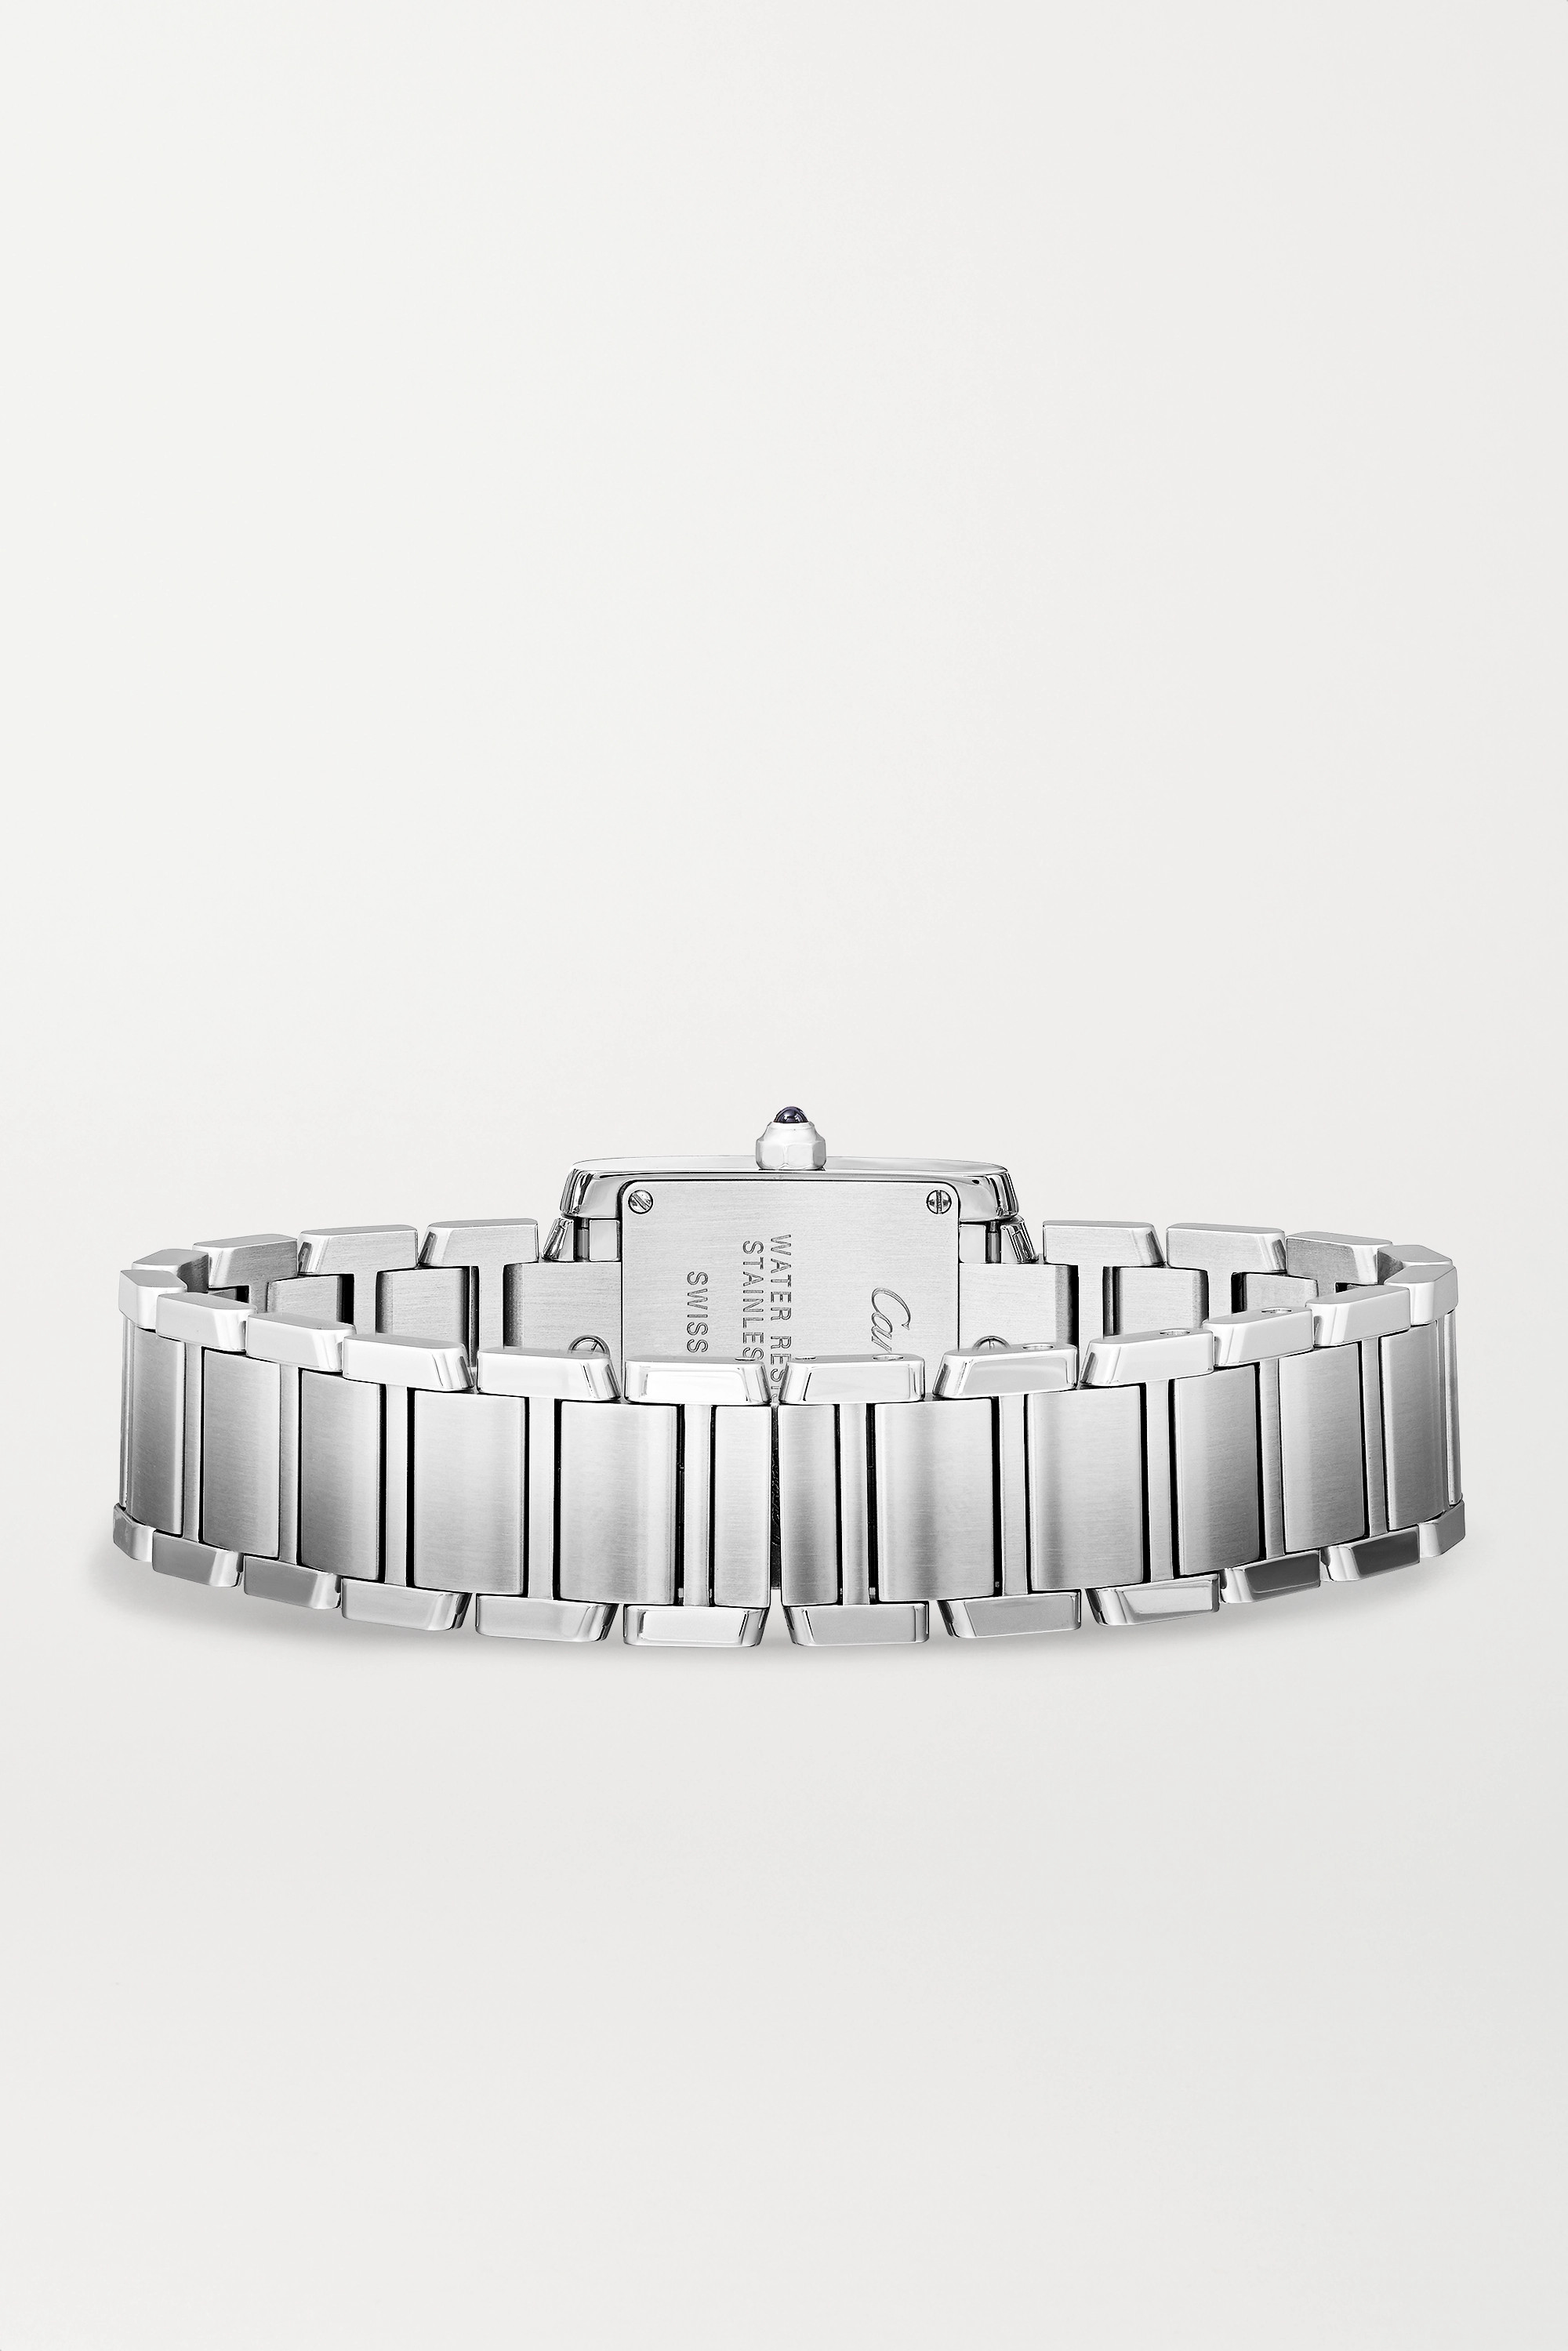 Cartier Tank Française 25.2 毫米精钢钻石小号腕表